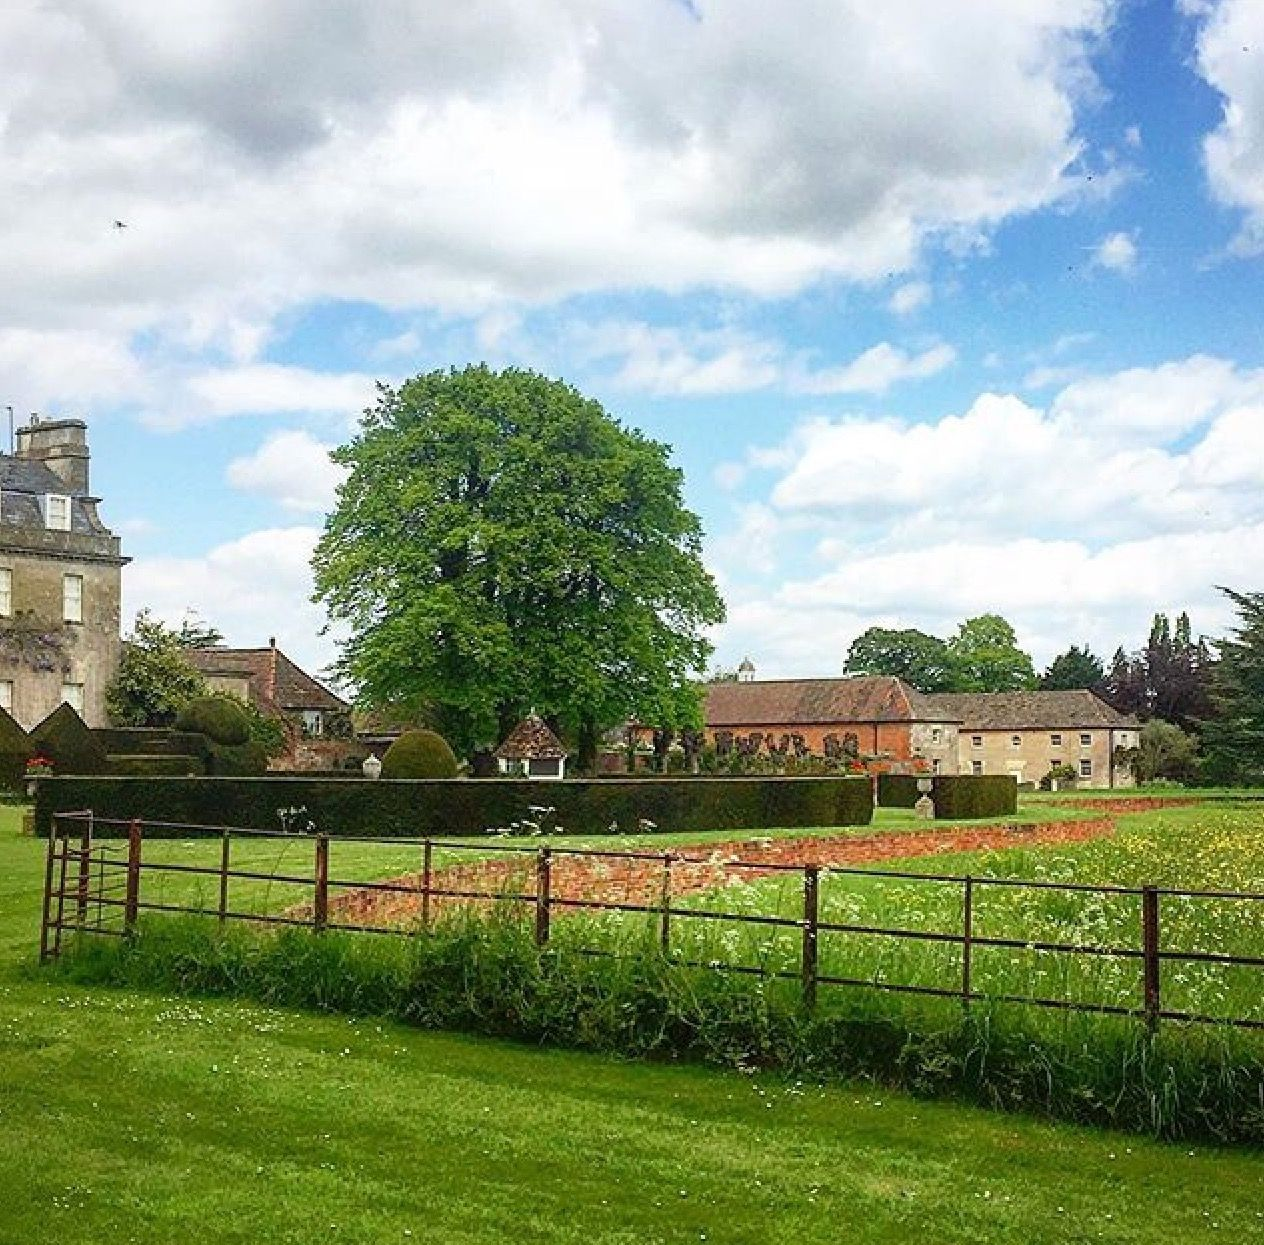 Pin by Amanda Clark on my English Garden | Manor garden ... on Kingdom Outdoor Living id=39553